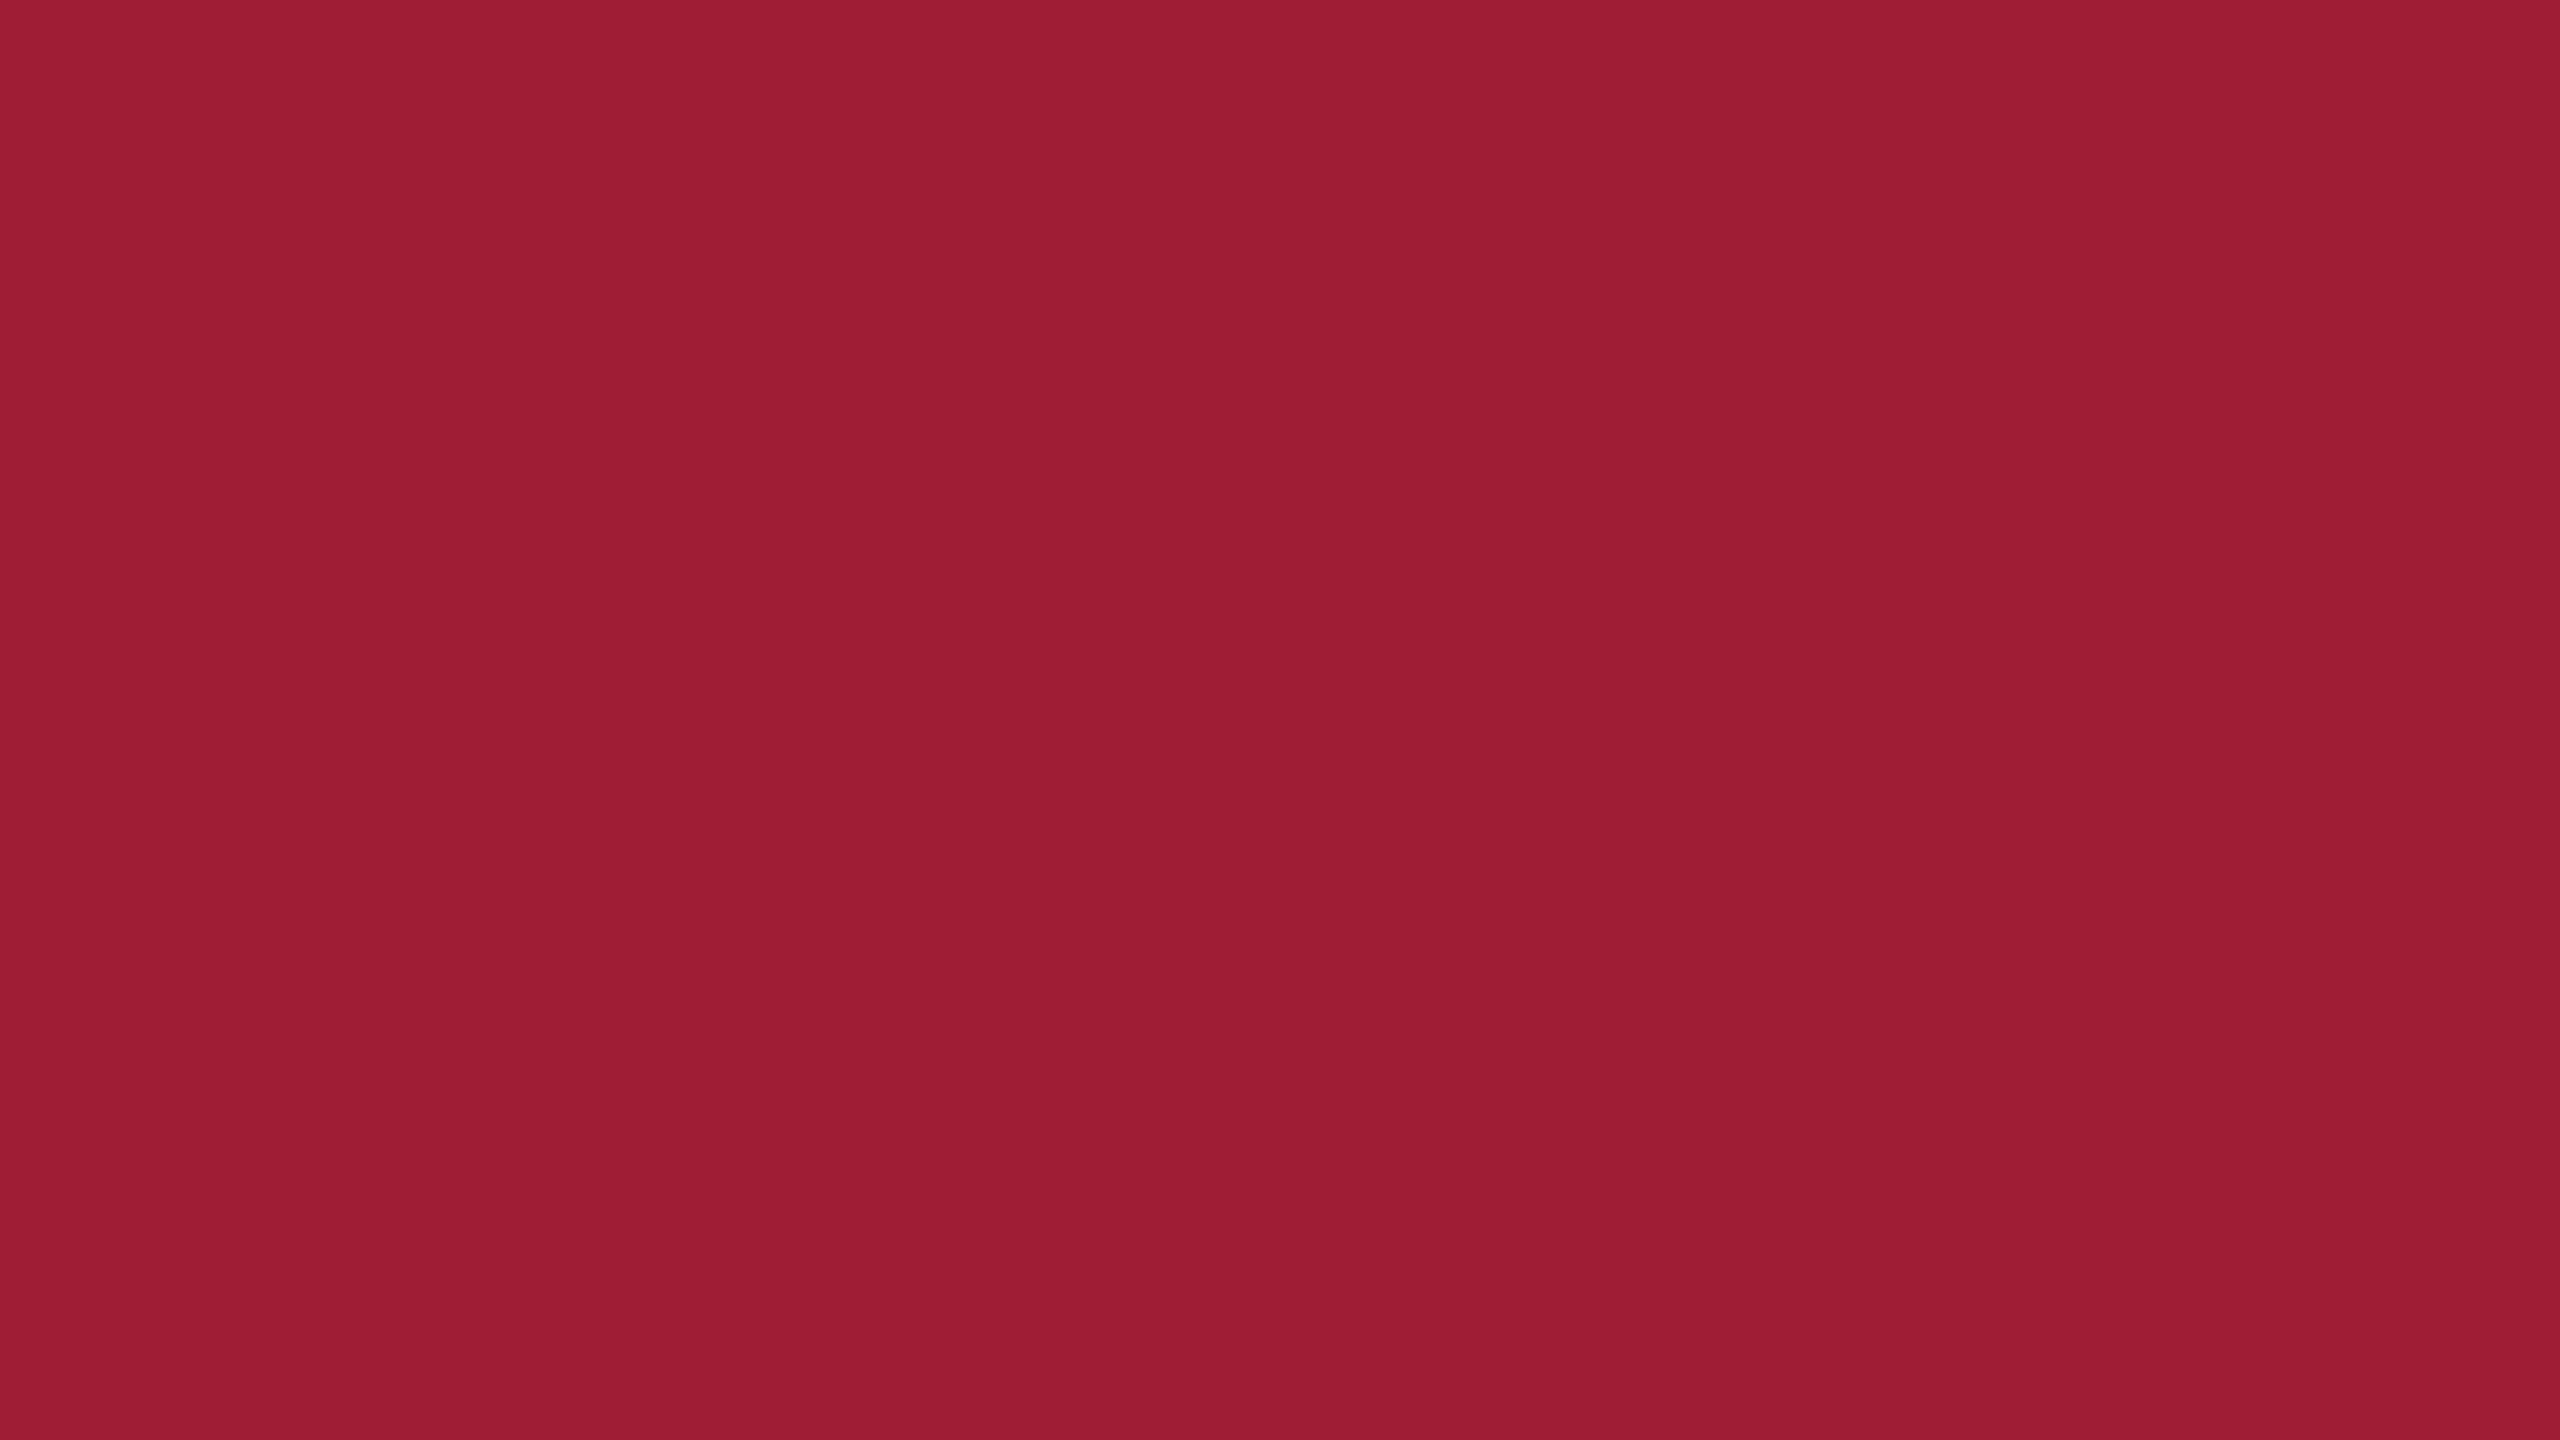 2560x1440 Vivid Burgundy Solid Color Background